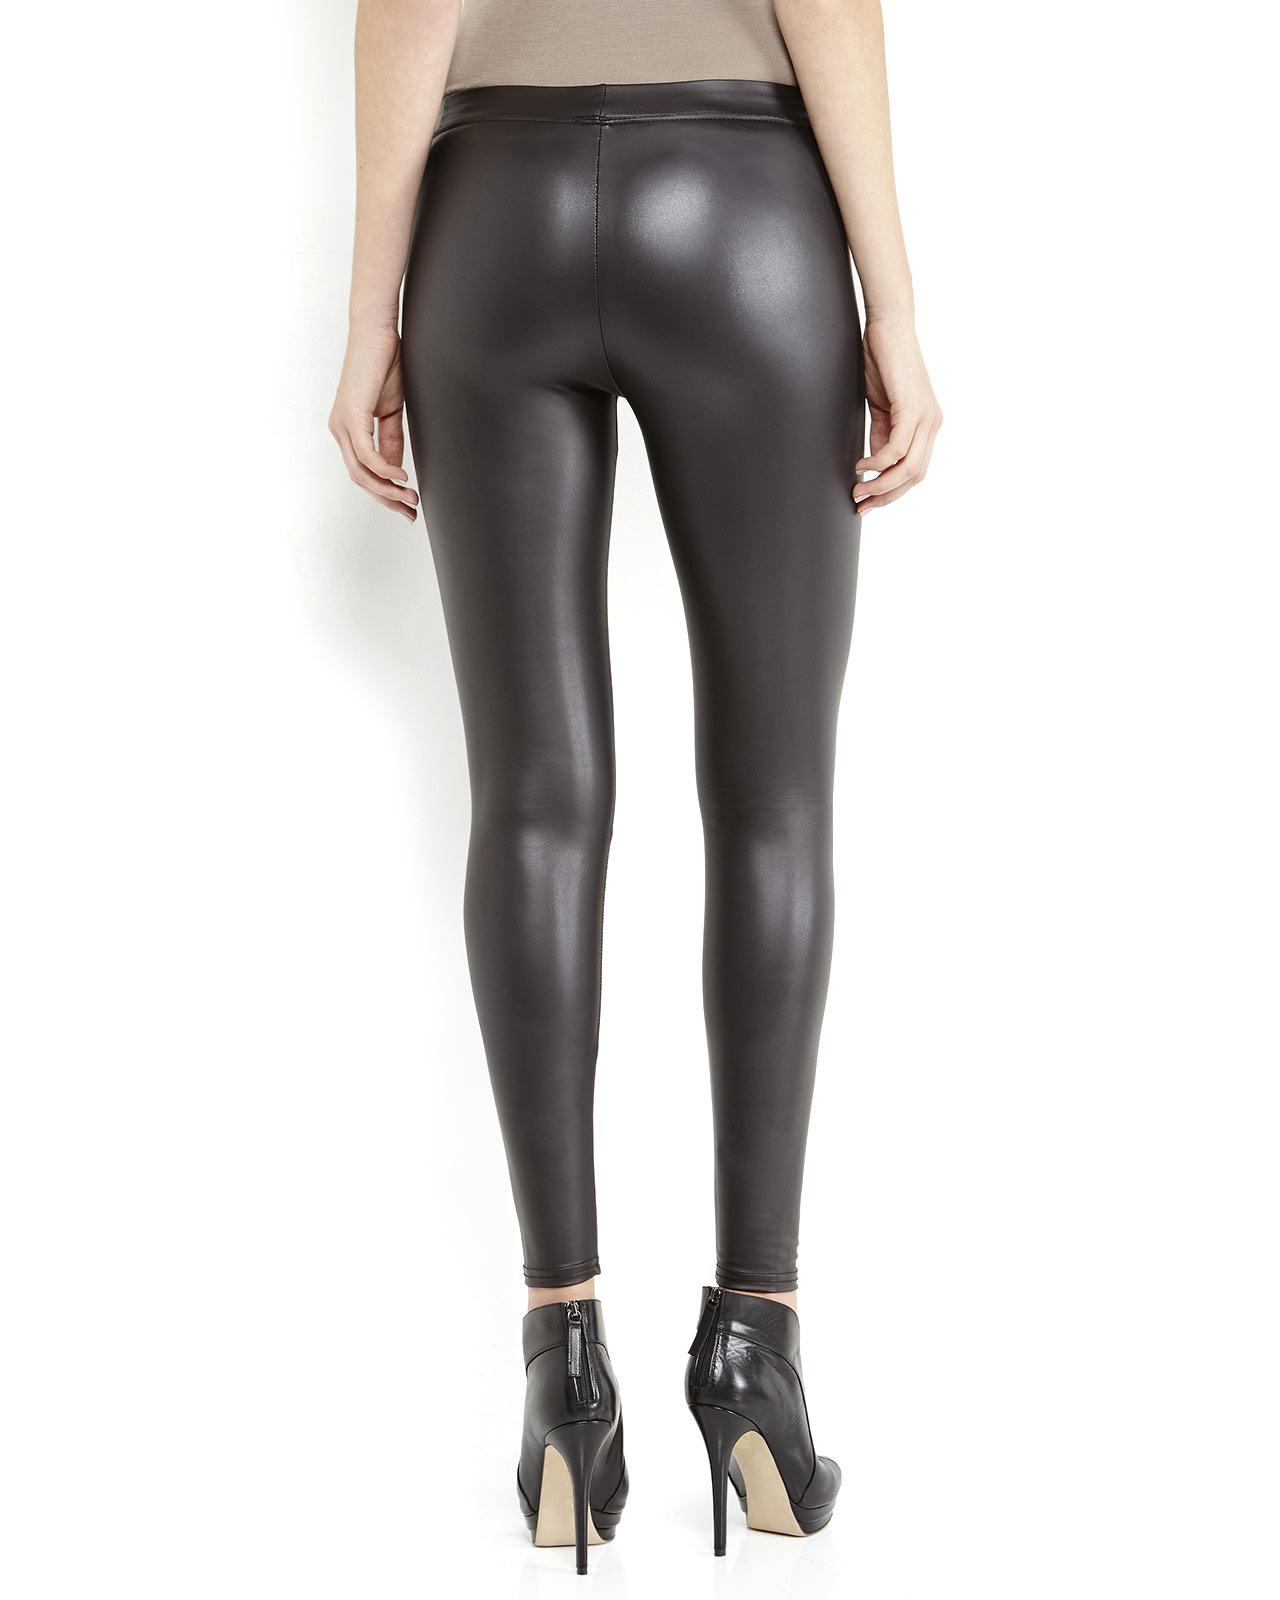 Tag elemental Black Leatherette Leggings in Black